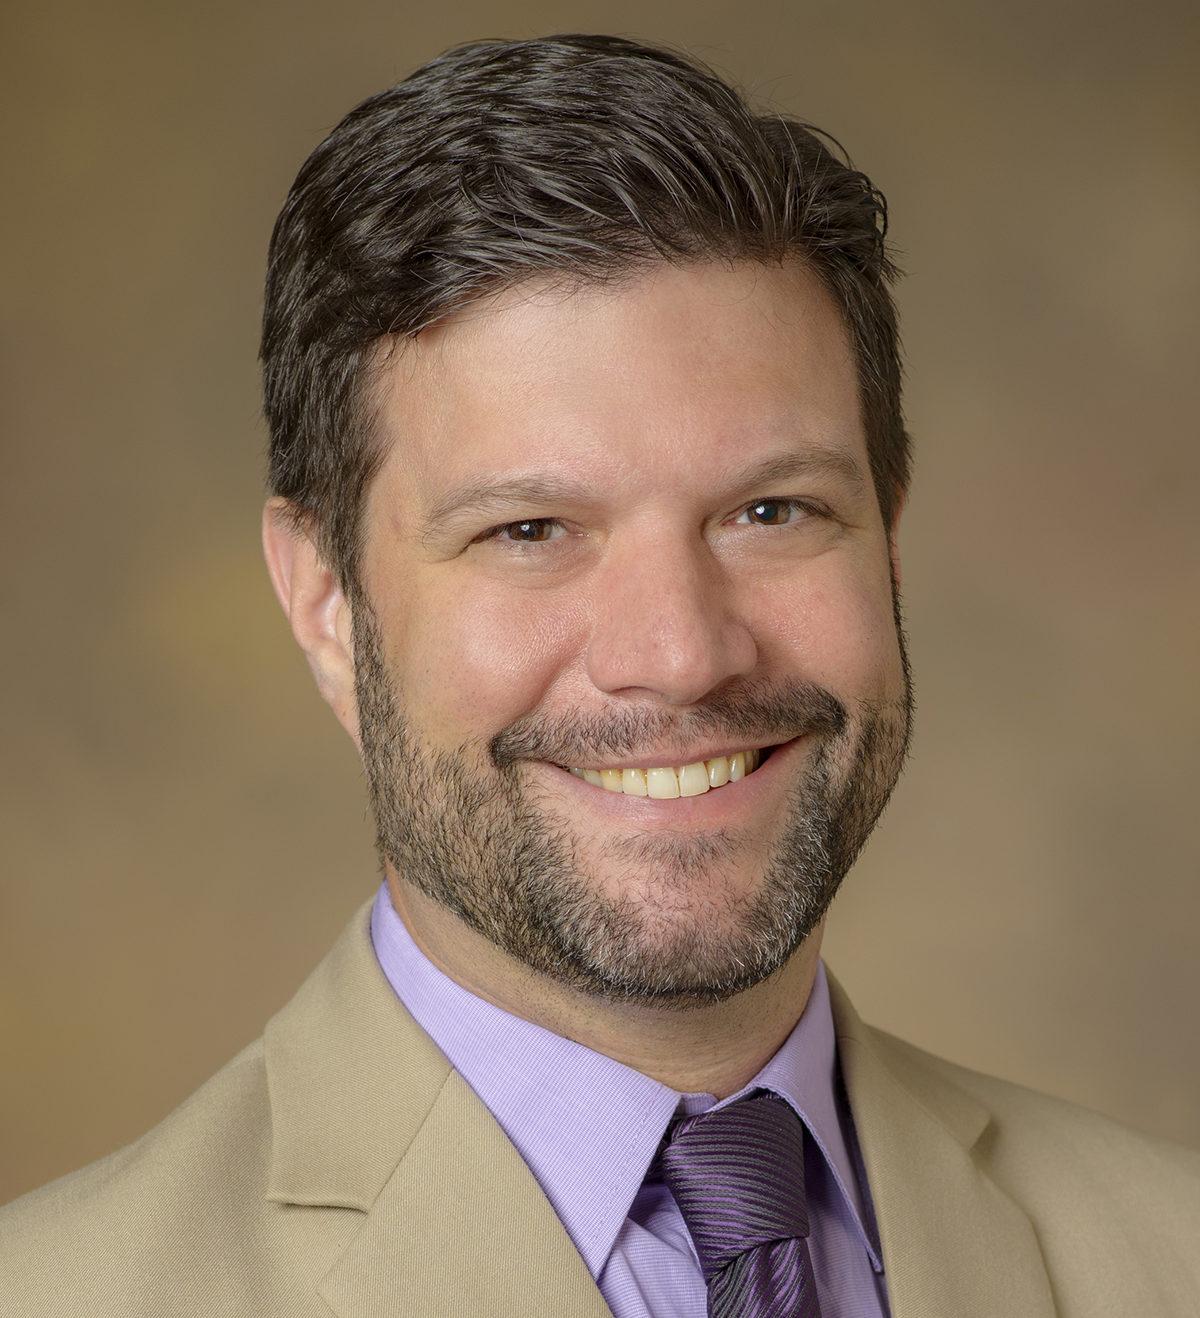 Adam Douglas Henry the Faces of Tucson Arizona professor